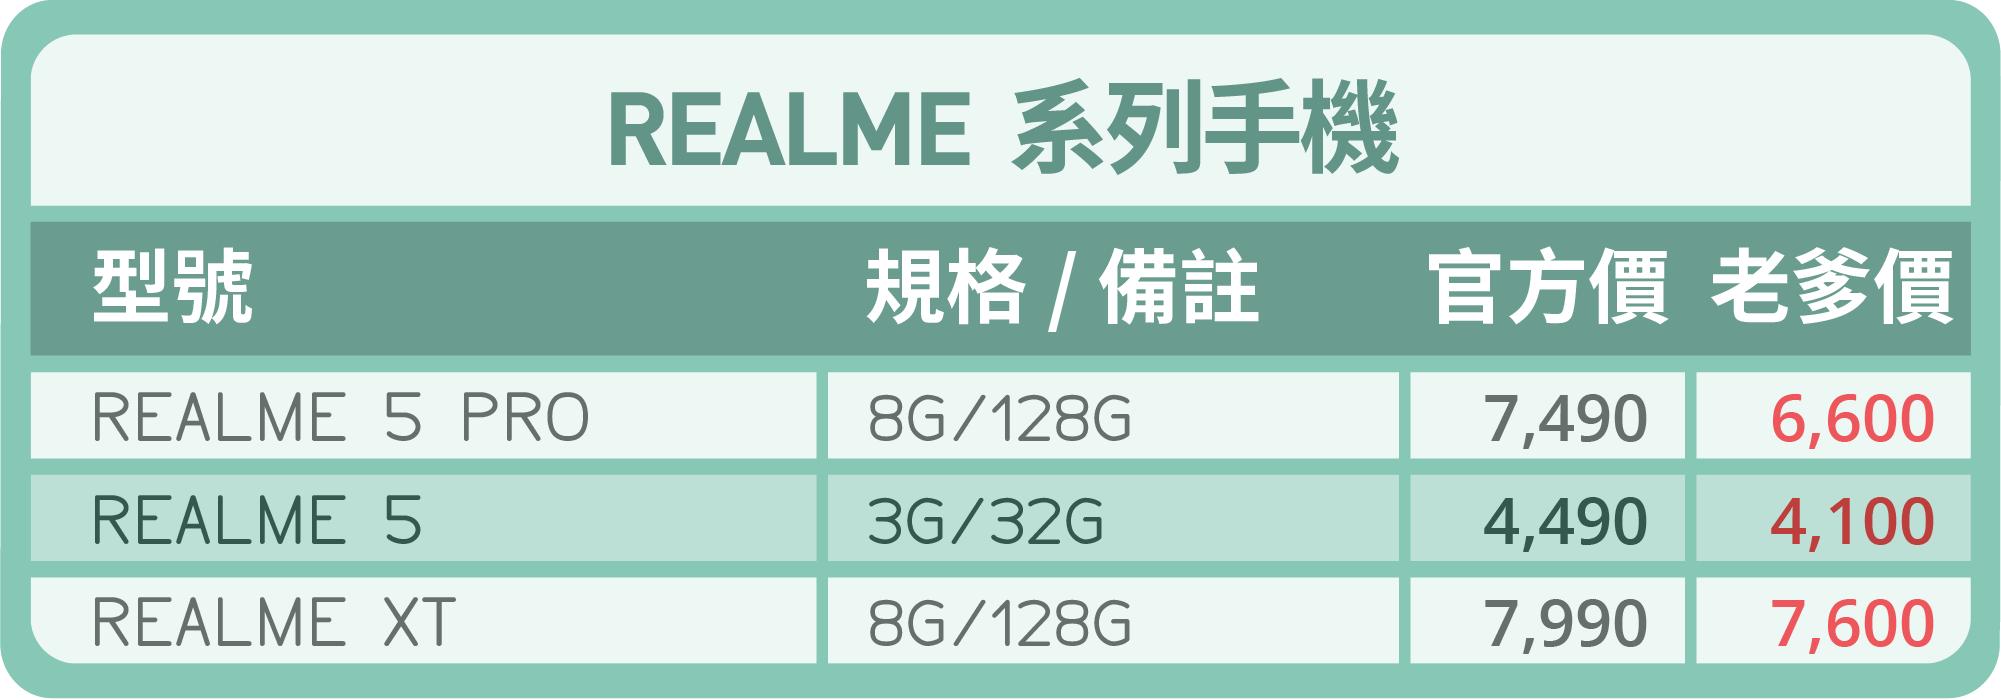 REALME手機優惠價-台中買手機